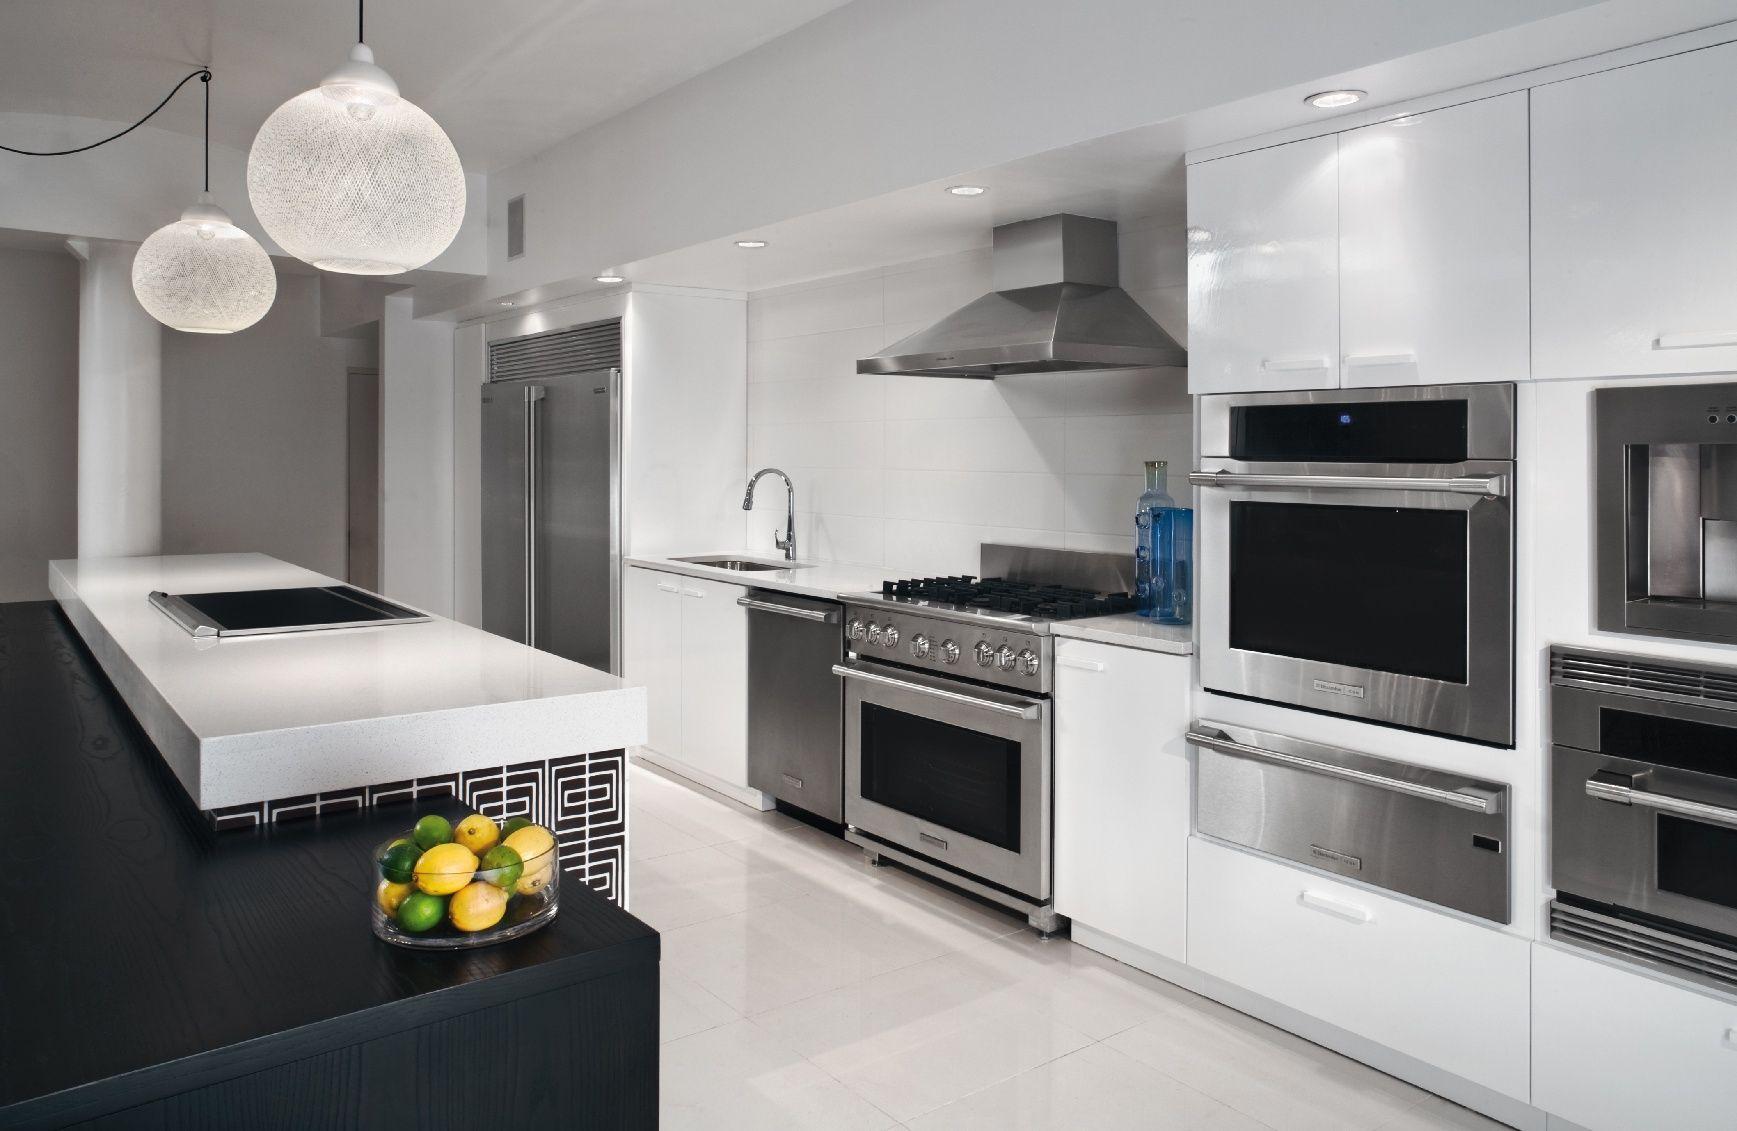 Affordable Kitchen Appliances